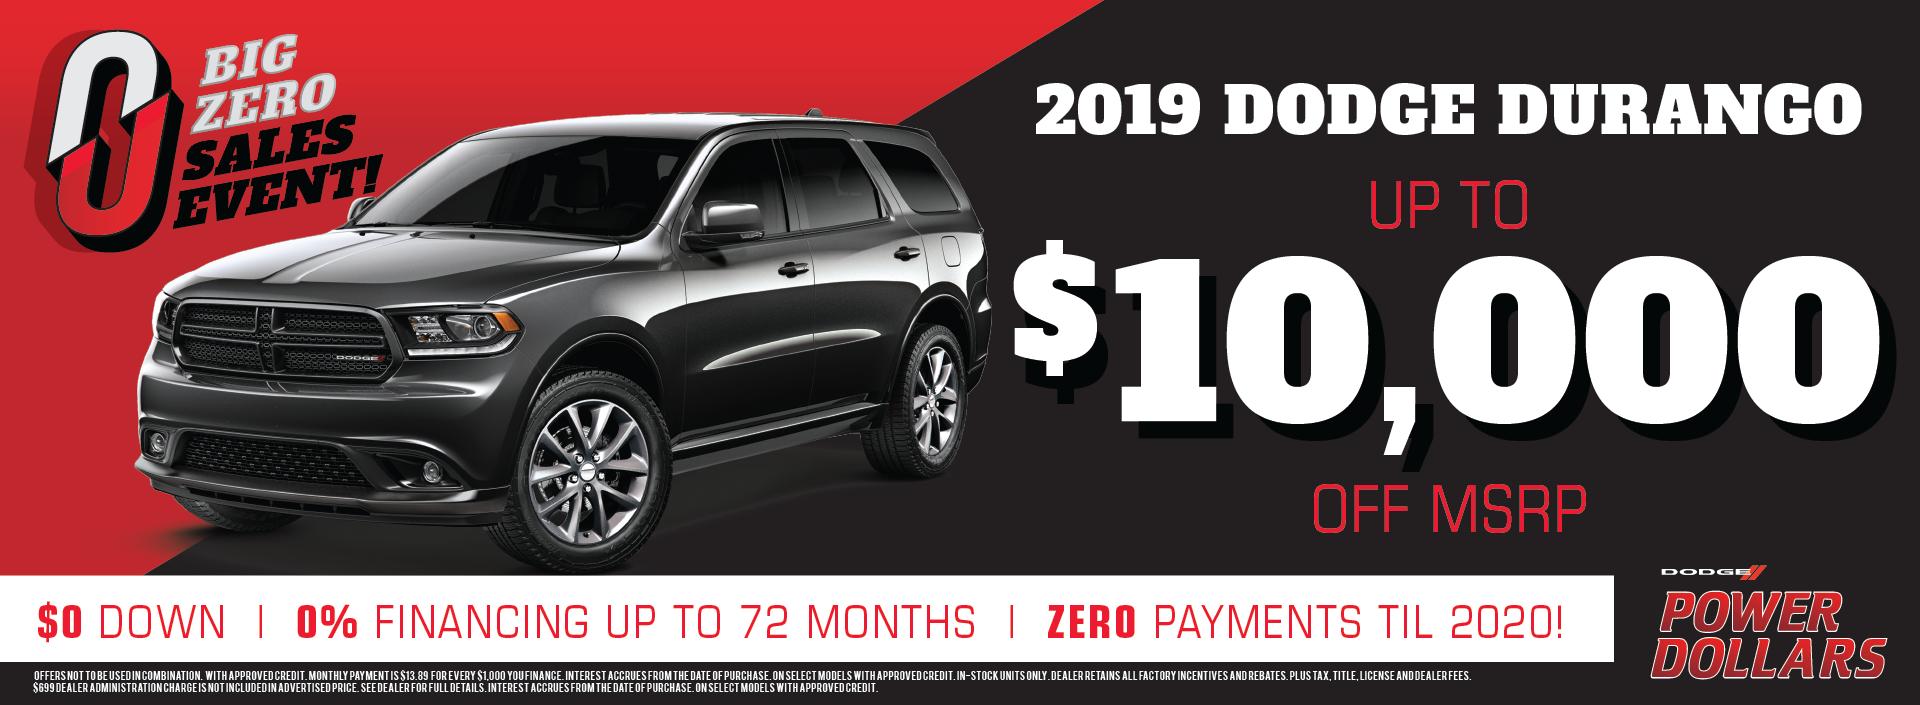 2019 Dodge Durango Sale!